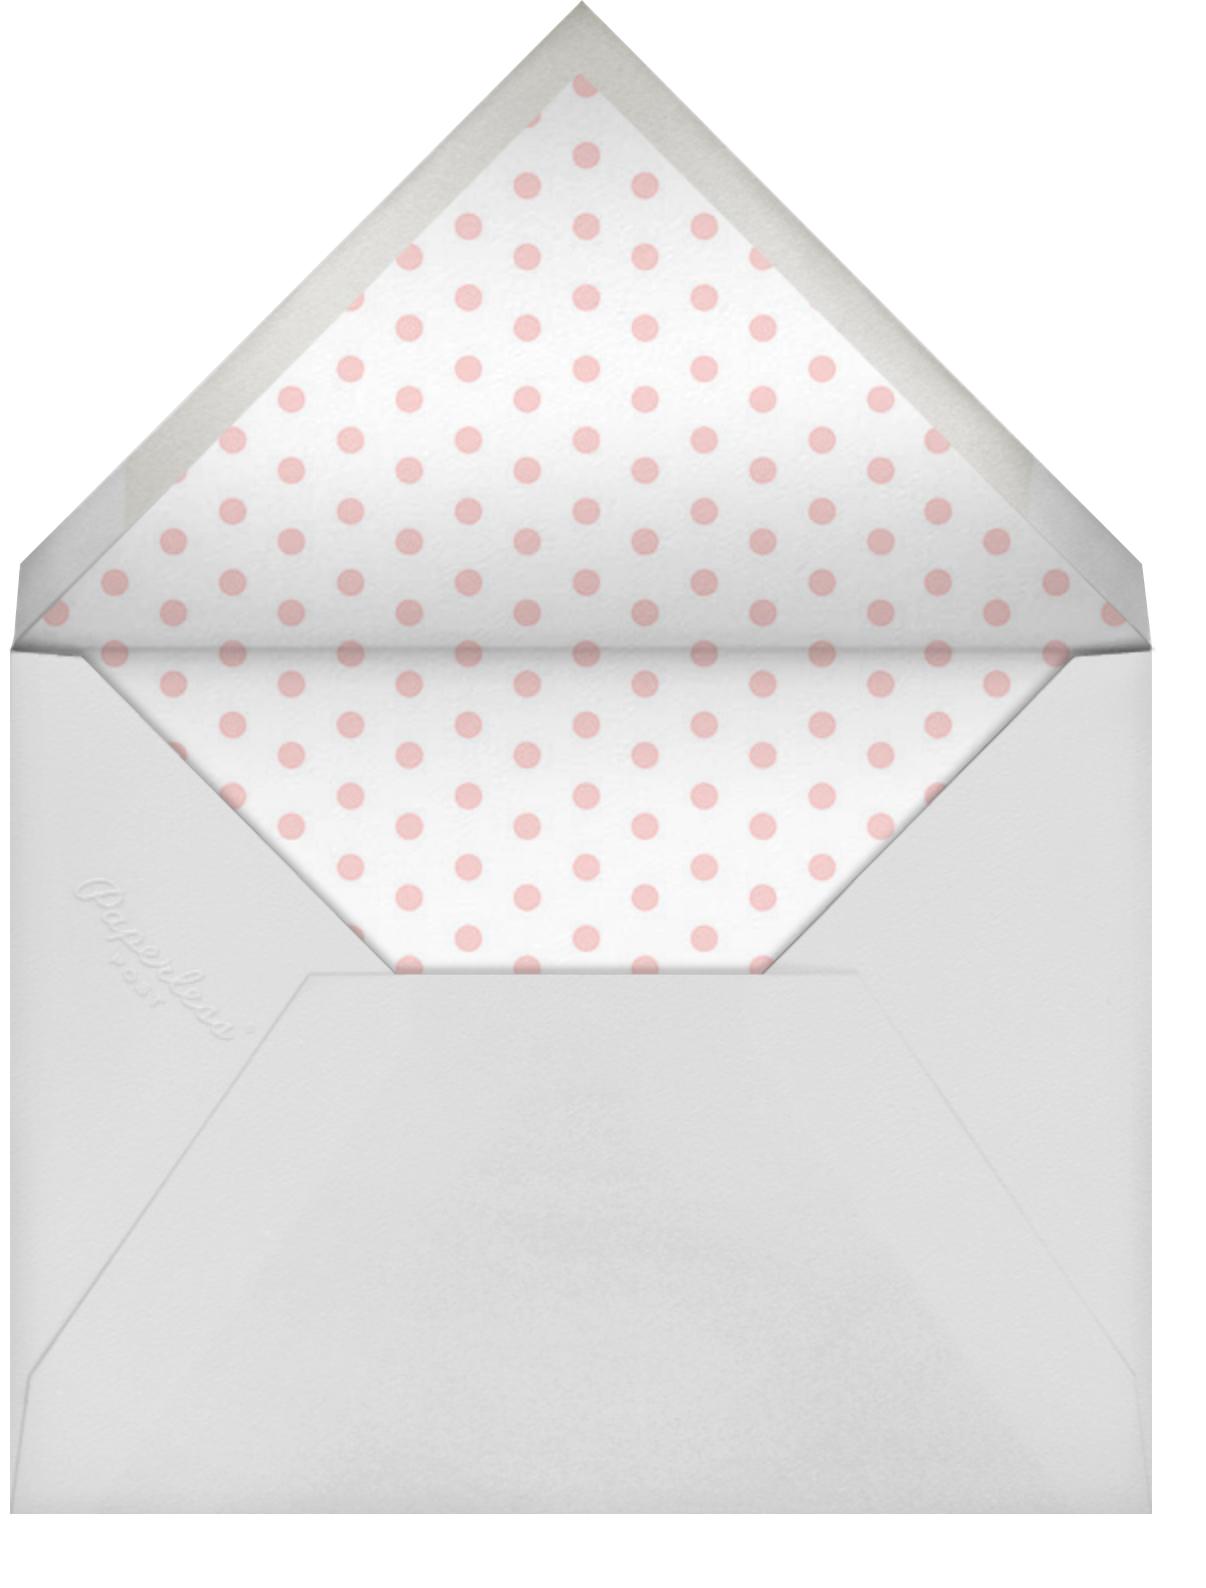 Heart Blossom Valentine's Day - Rifle Paper Co. - Valentine's Day - envelope back